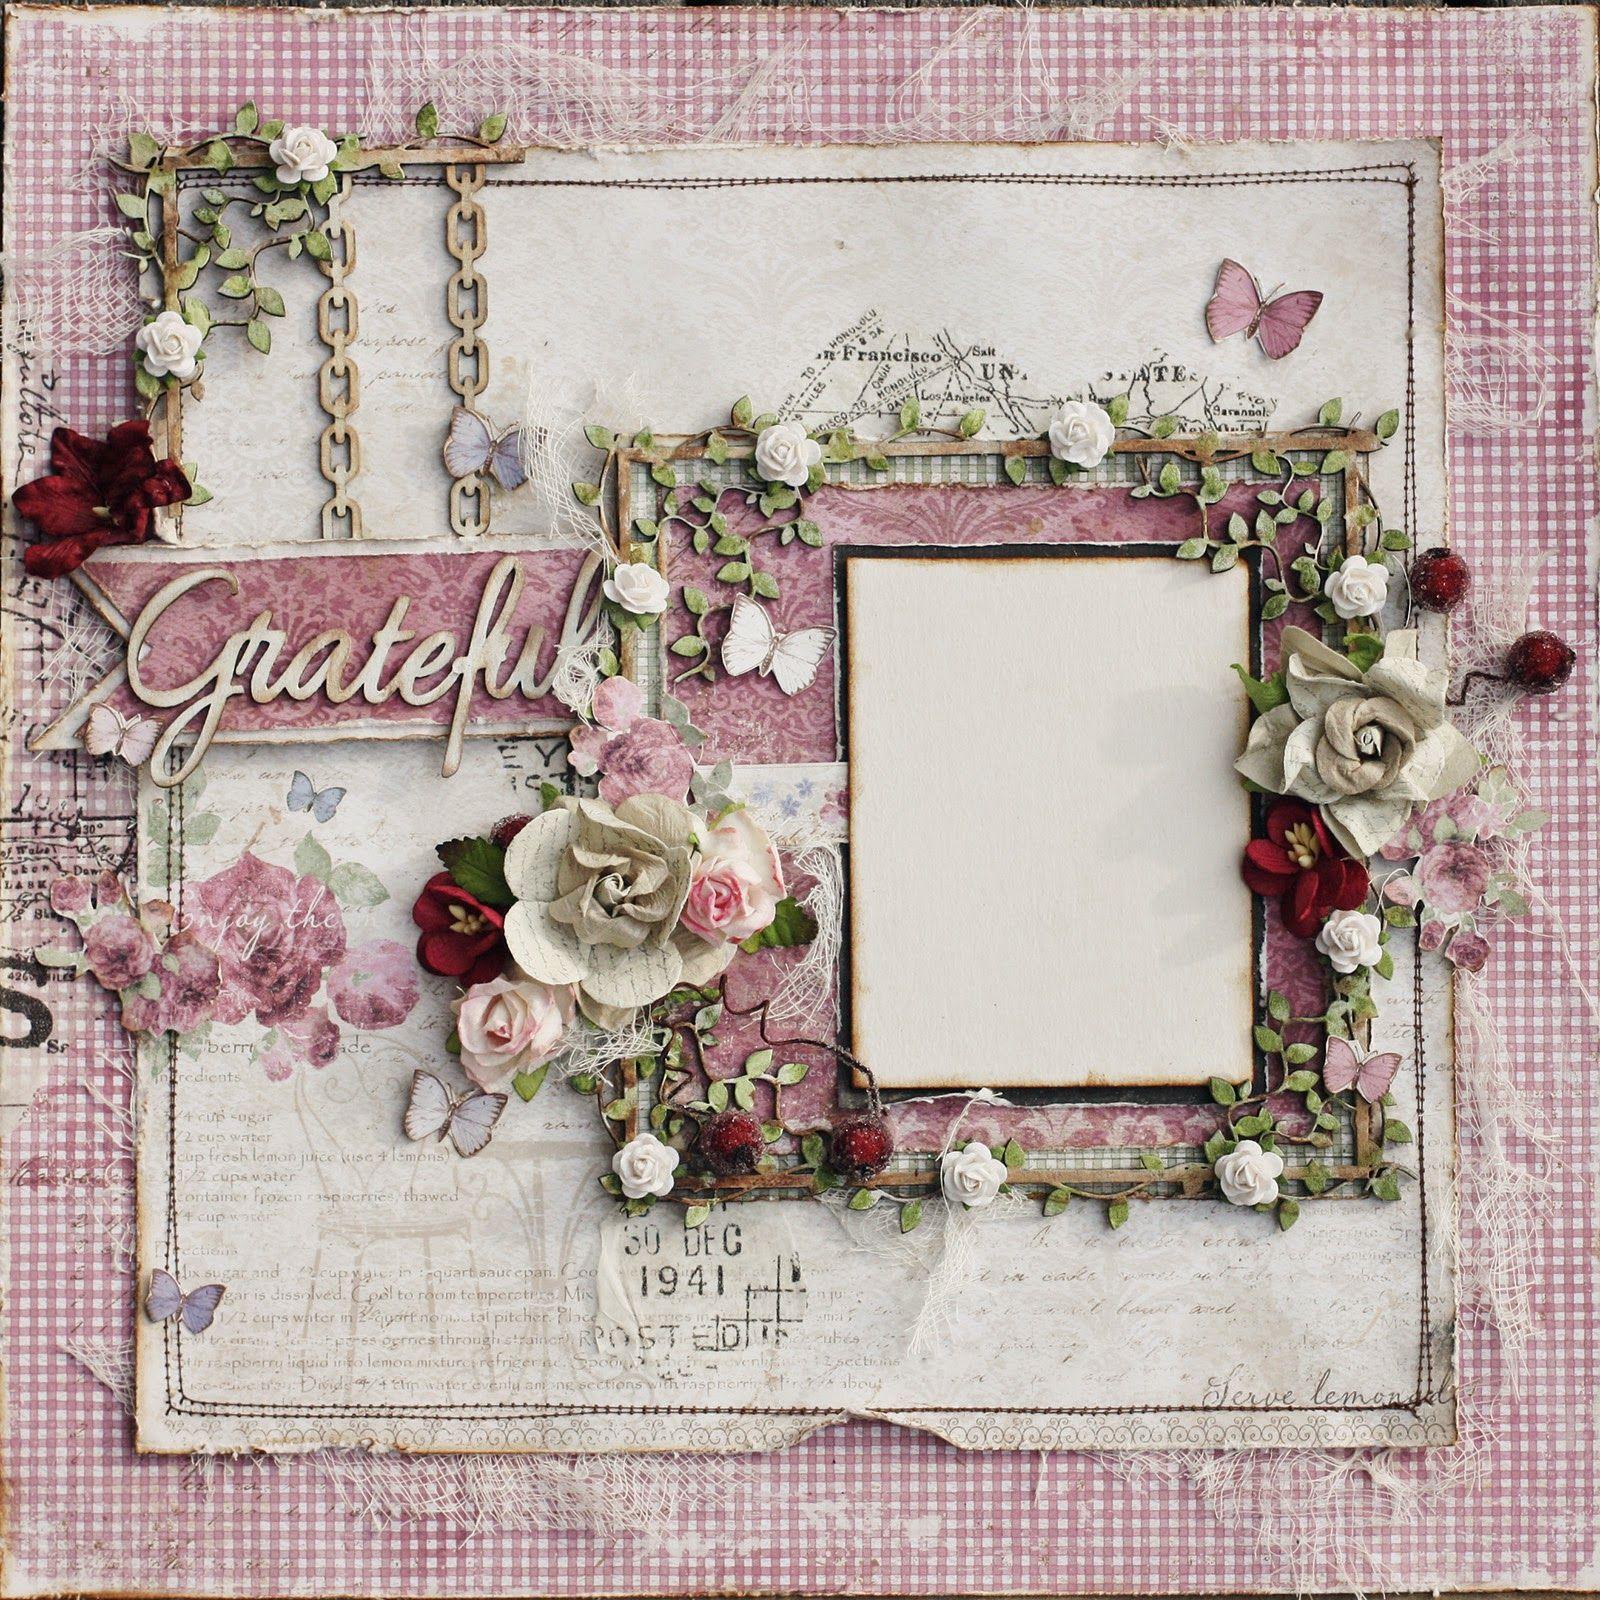 Scrapbook ideas romantic - Grateful Romantic Scrapbook Layout Such A Pretty Mess Blog Scrapbook Diaries Kit Page